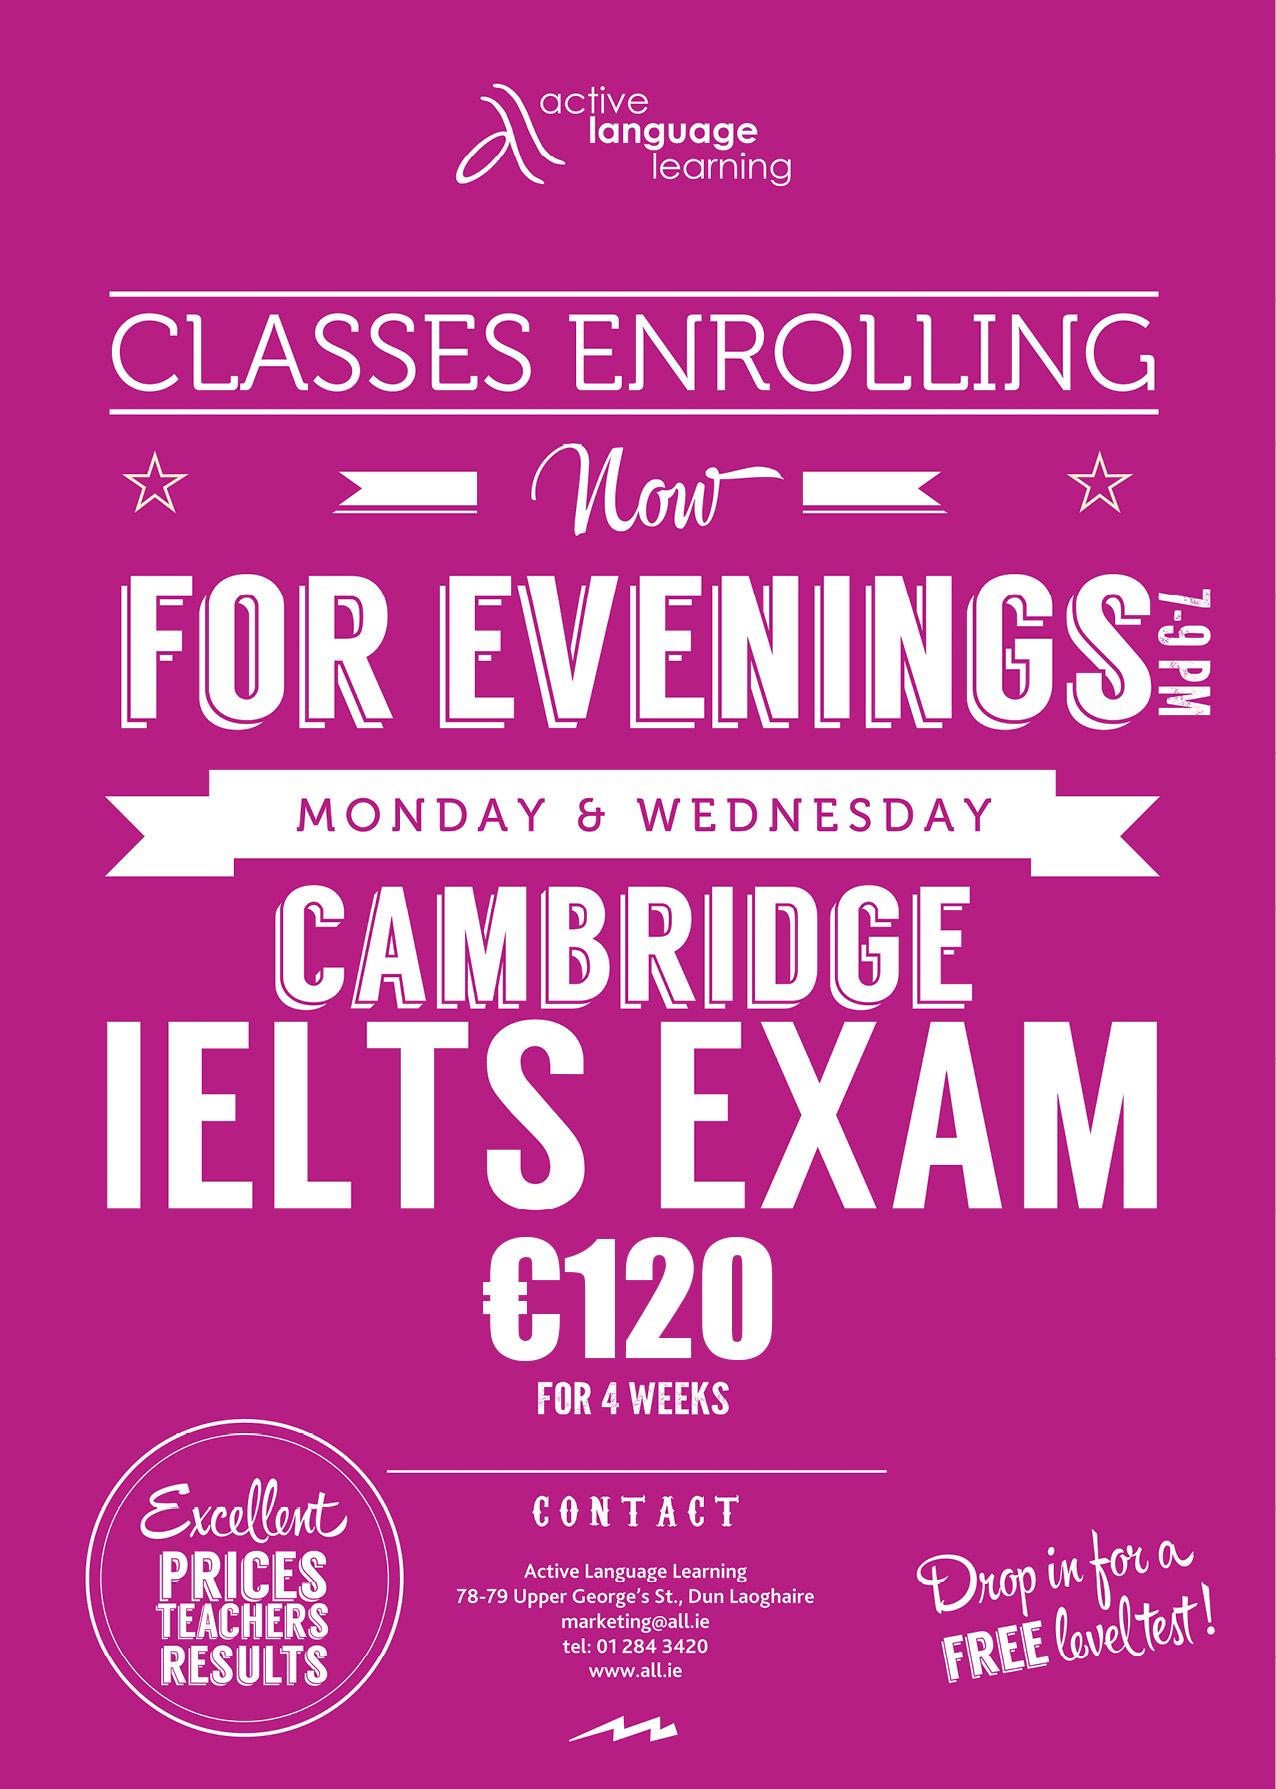 IELTS Exam Preparation Evening Class Now Enrolling